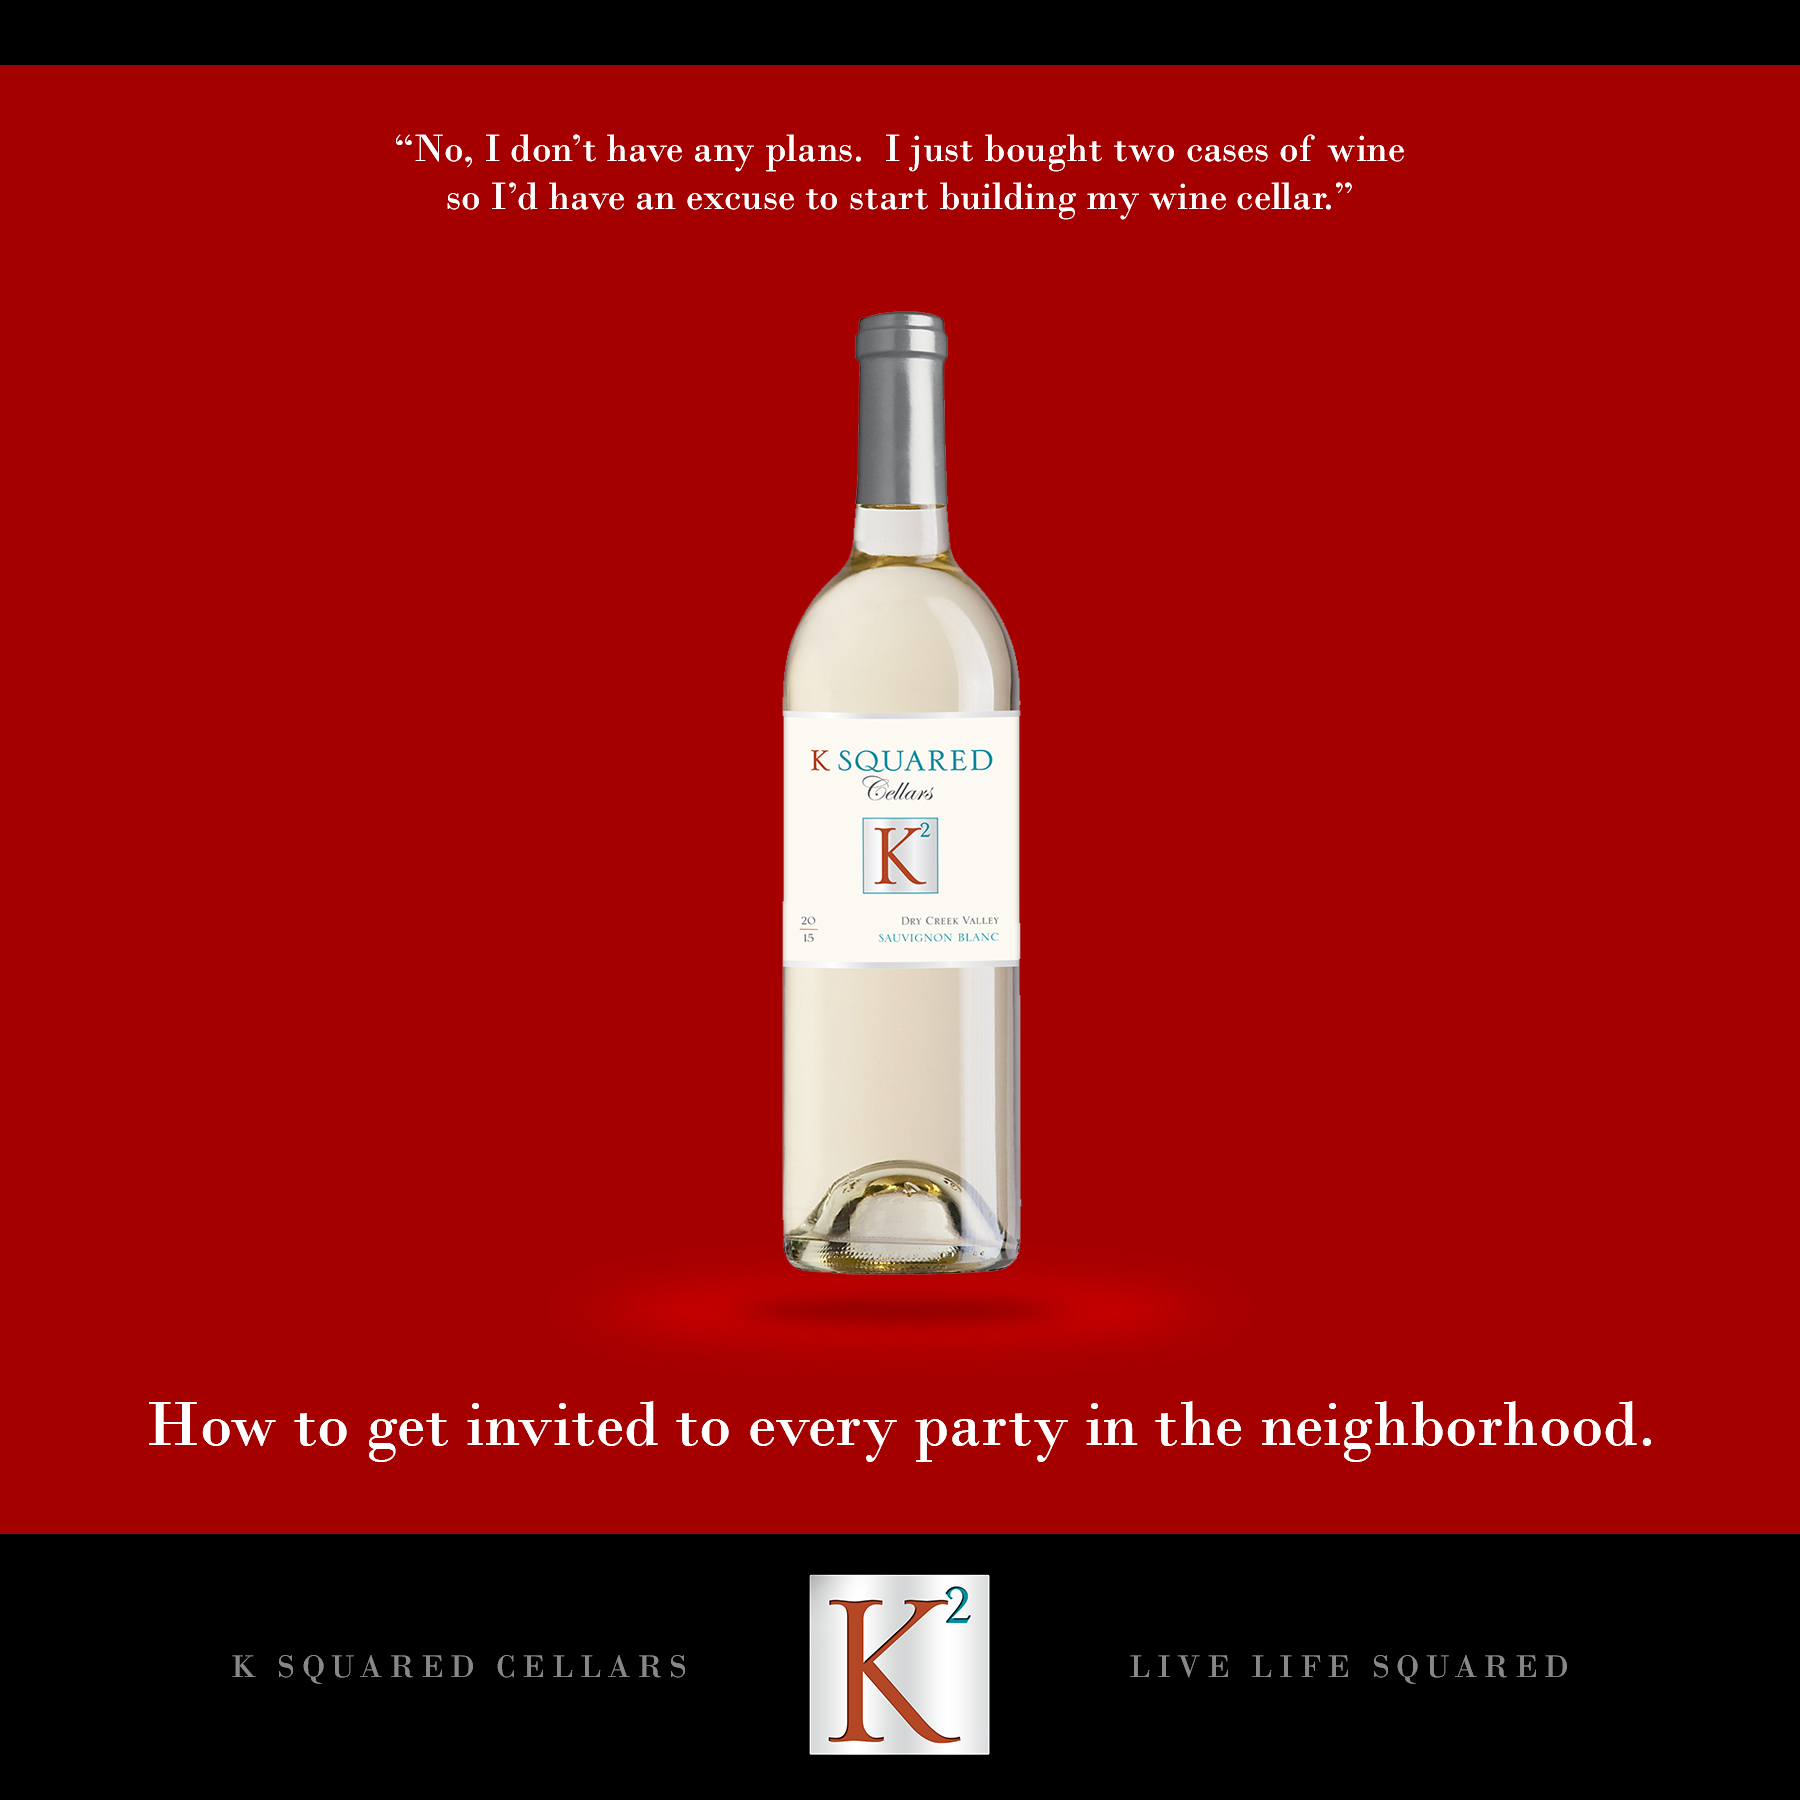 K Squared Cellars EVERY PARTY base by Graham Hnedak Brand G Creative 22 NOV 2016.jpg